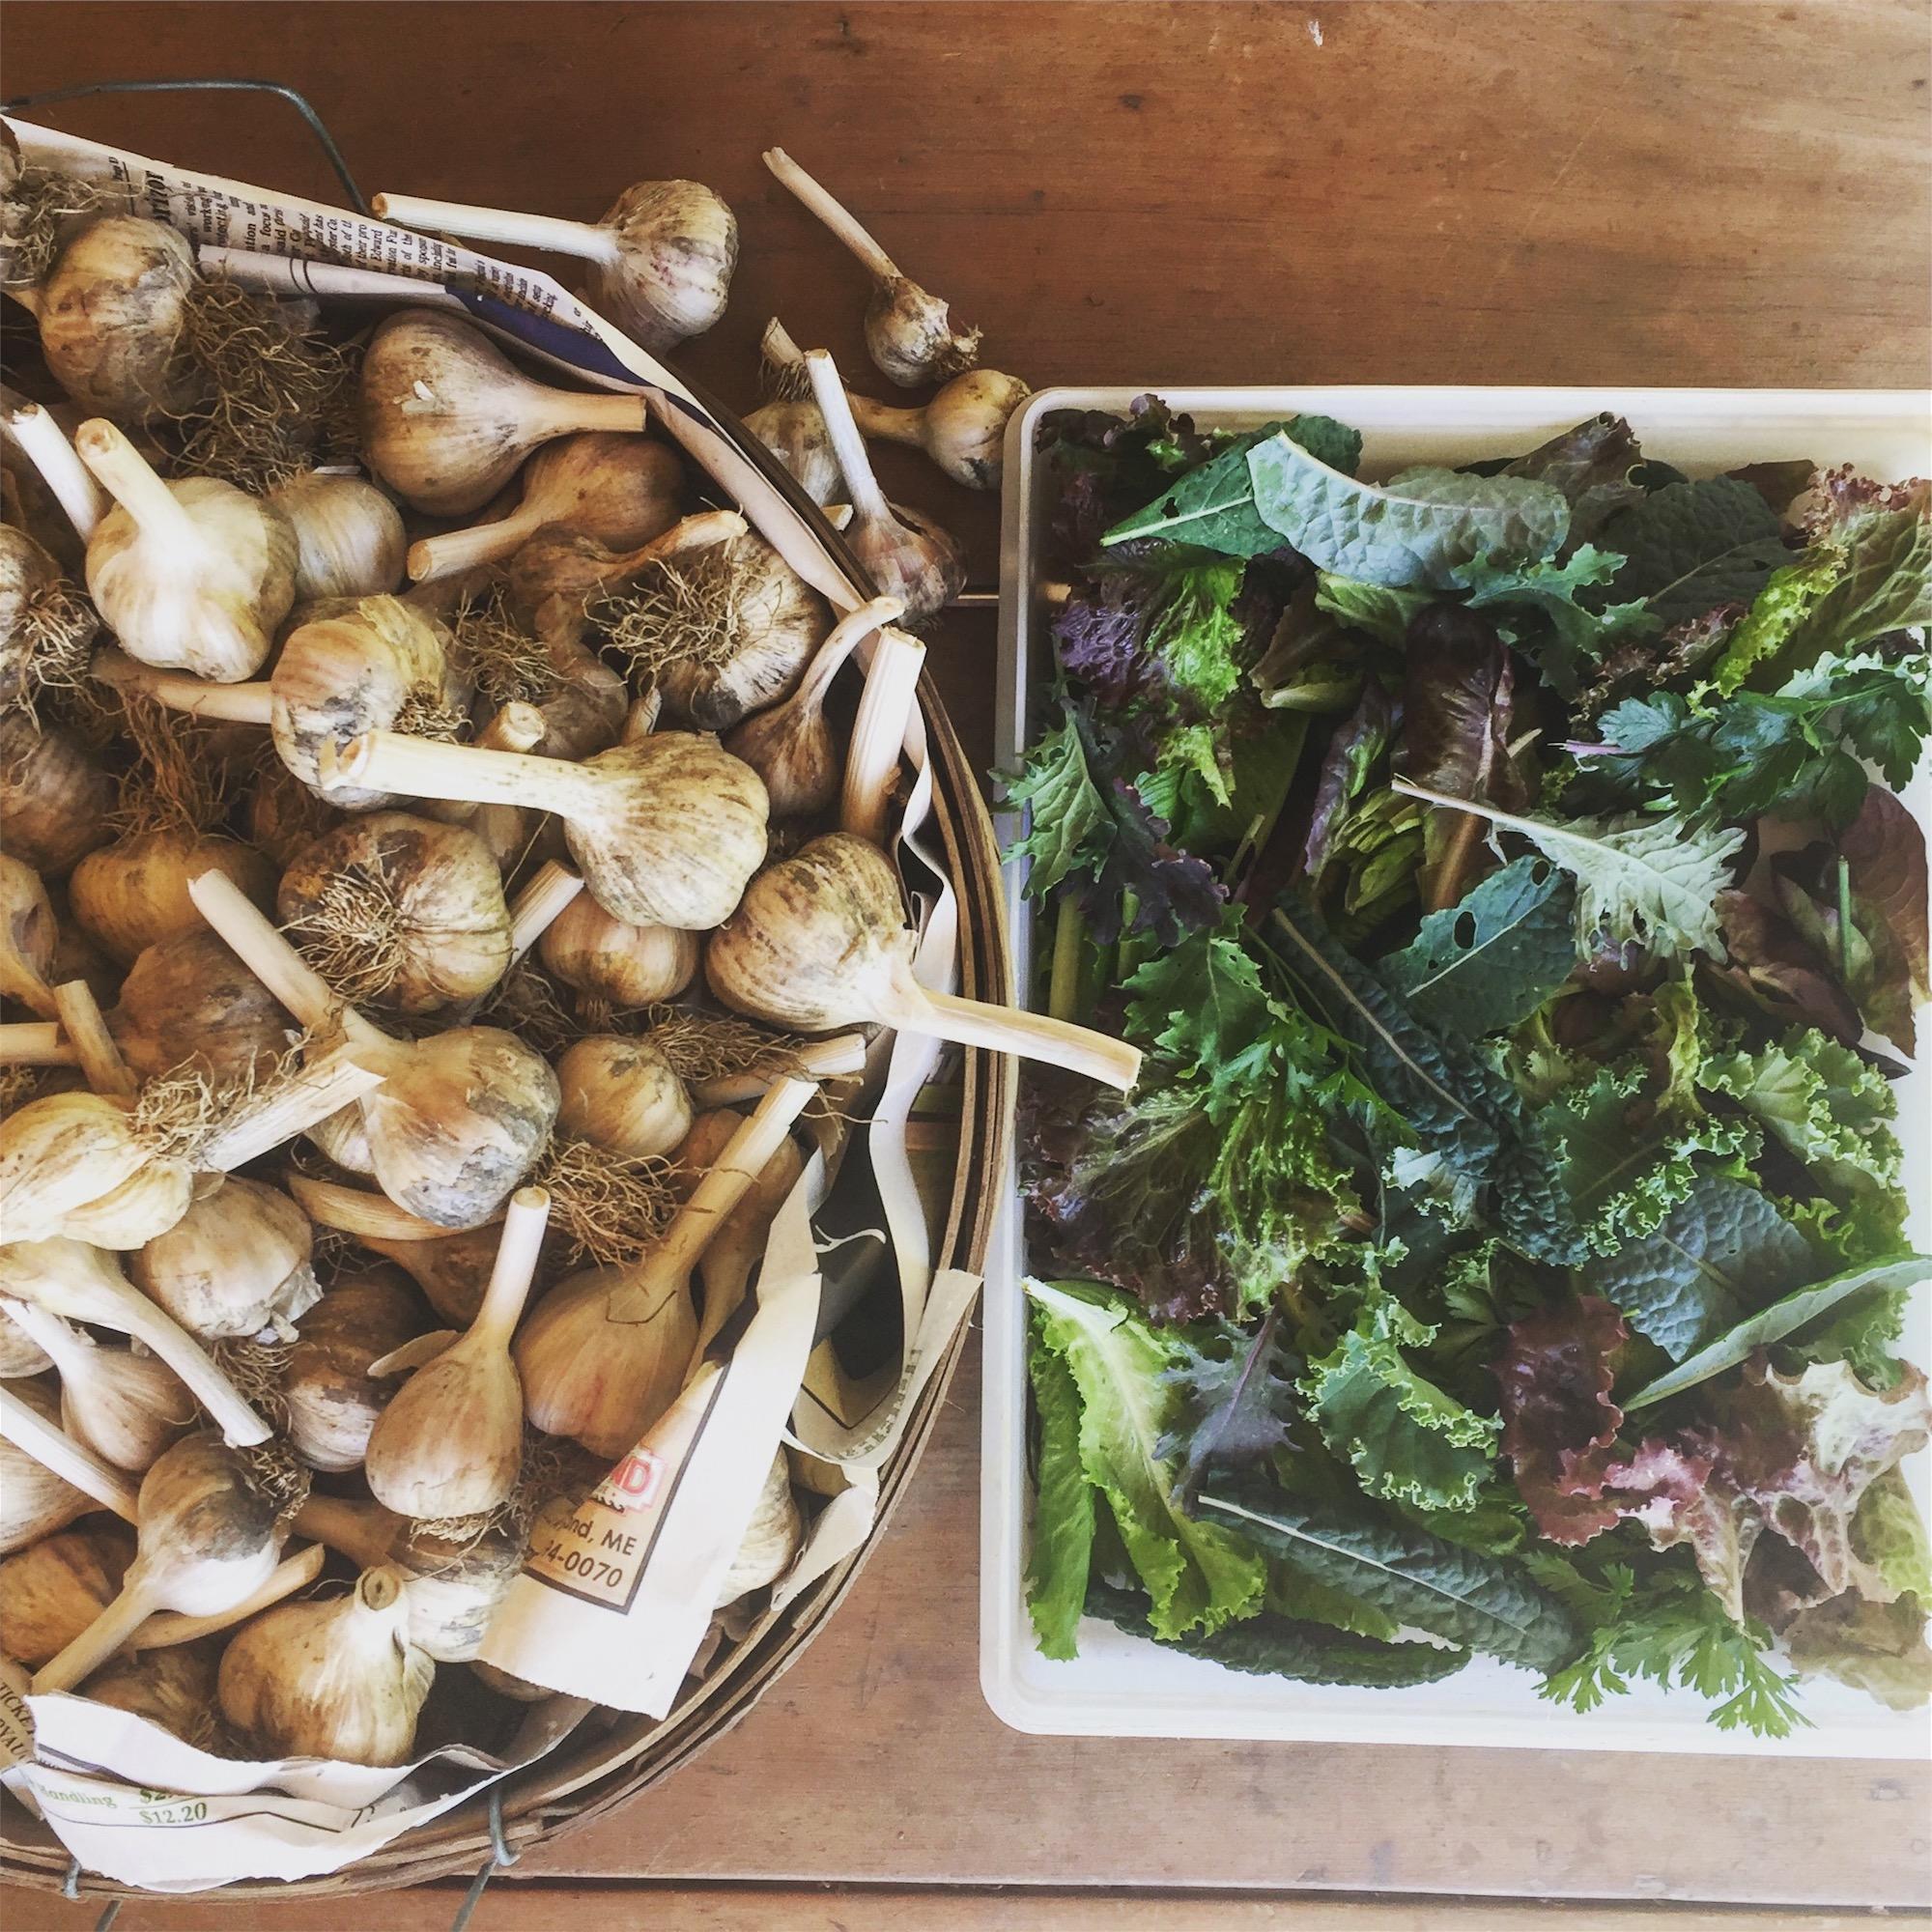 HiP Paris Blog explores countryside women